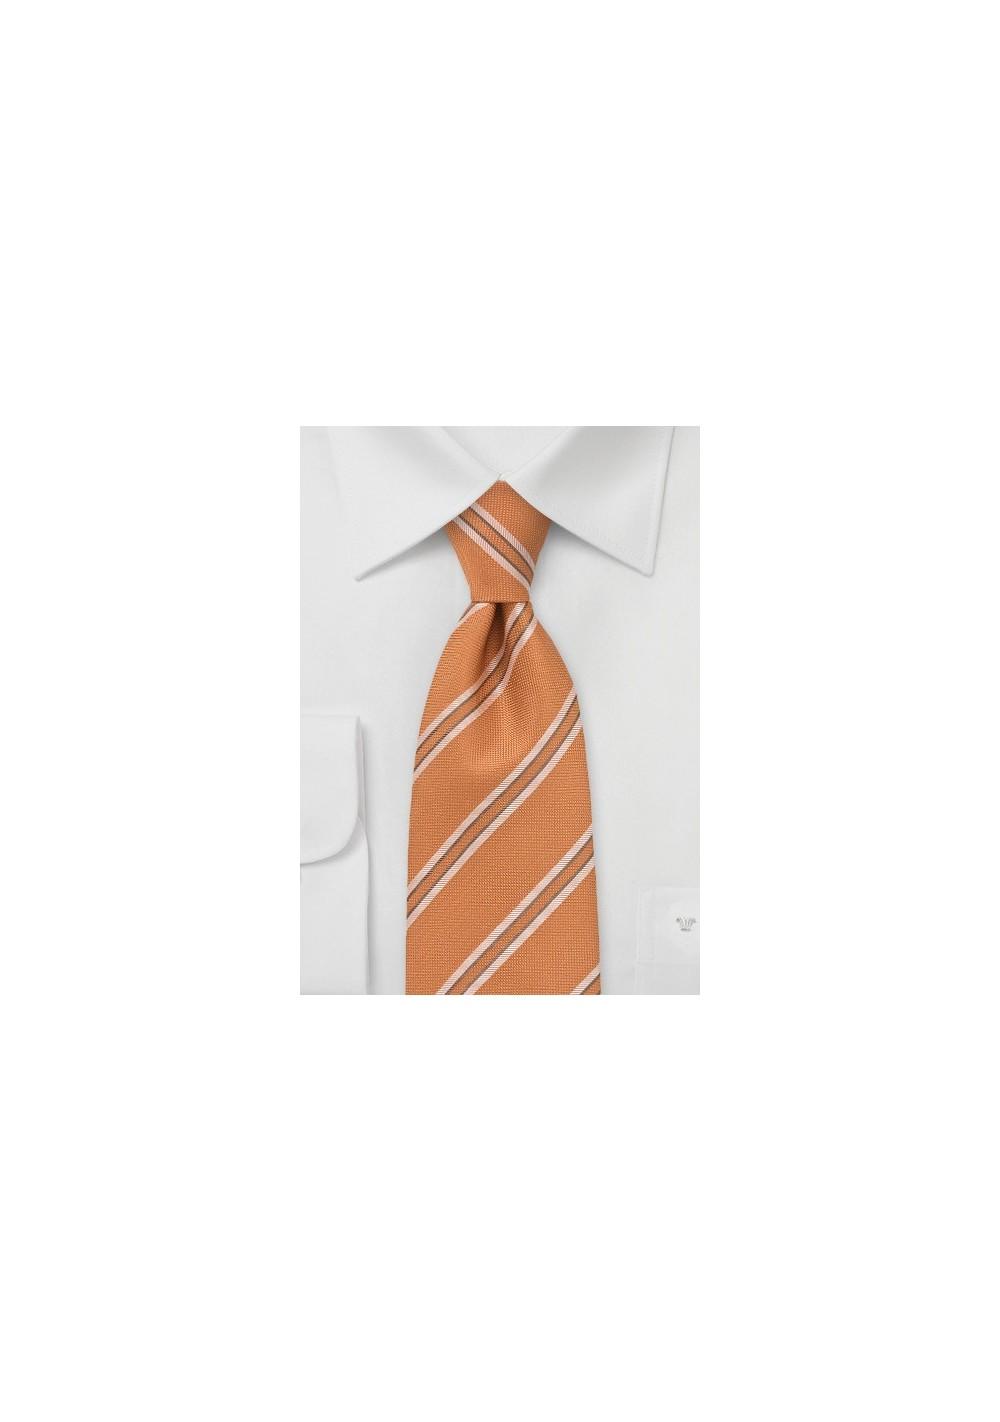 Light Tangerine and Tan Tie